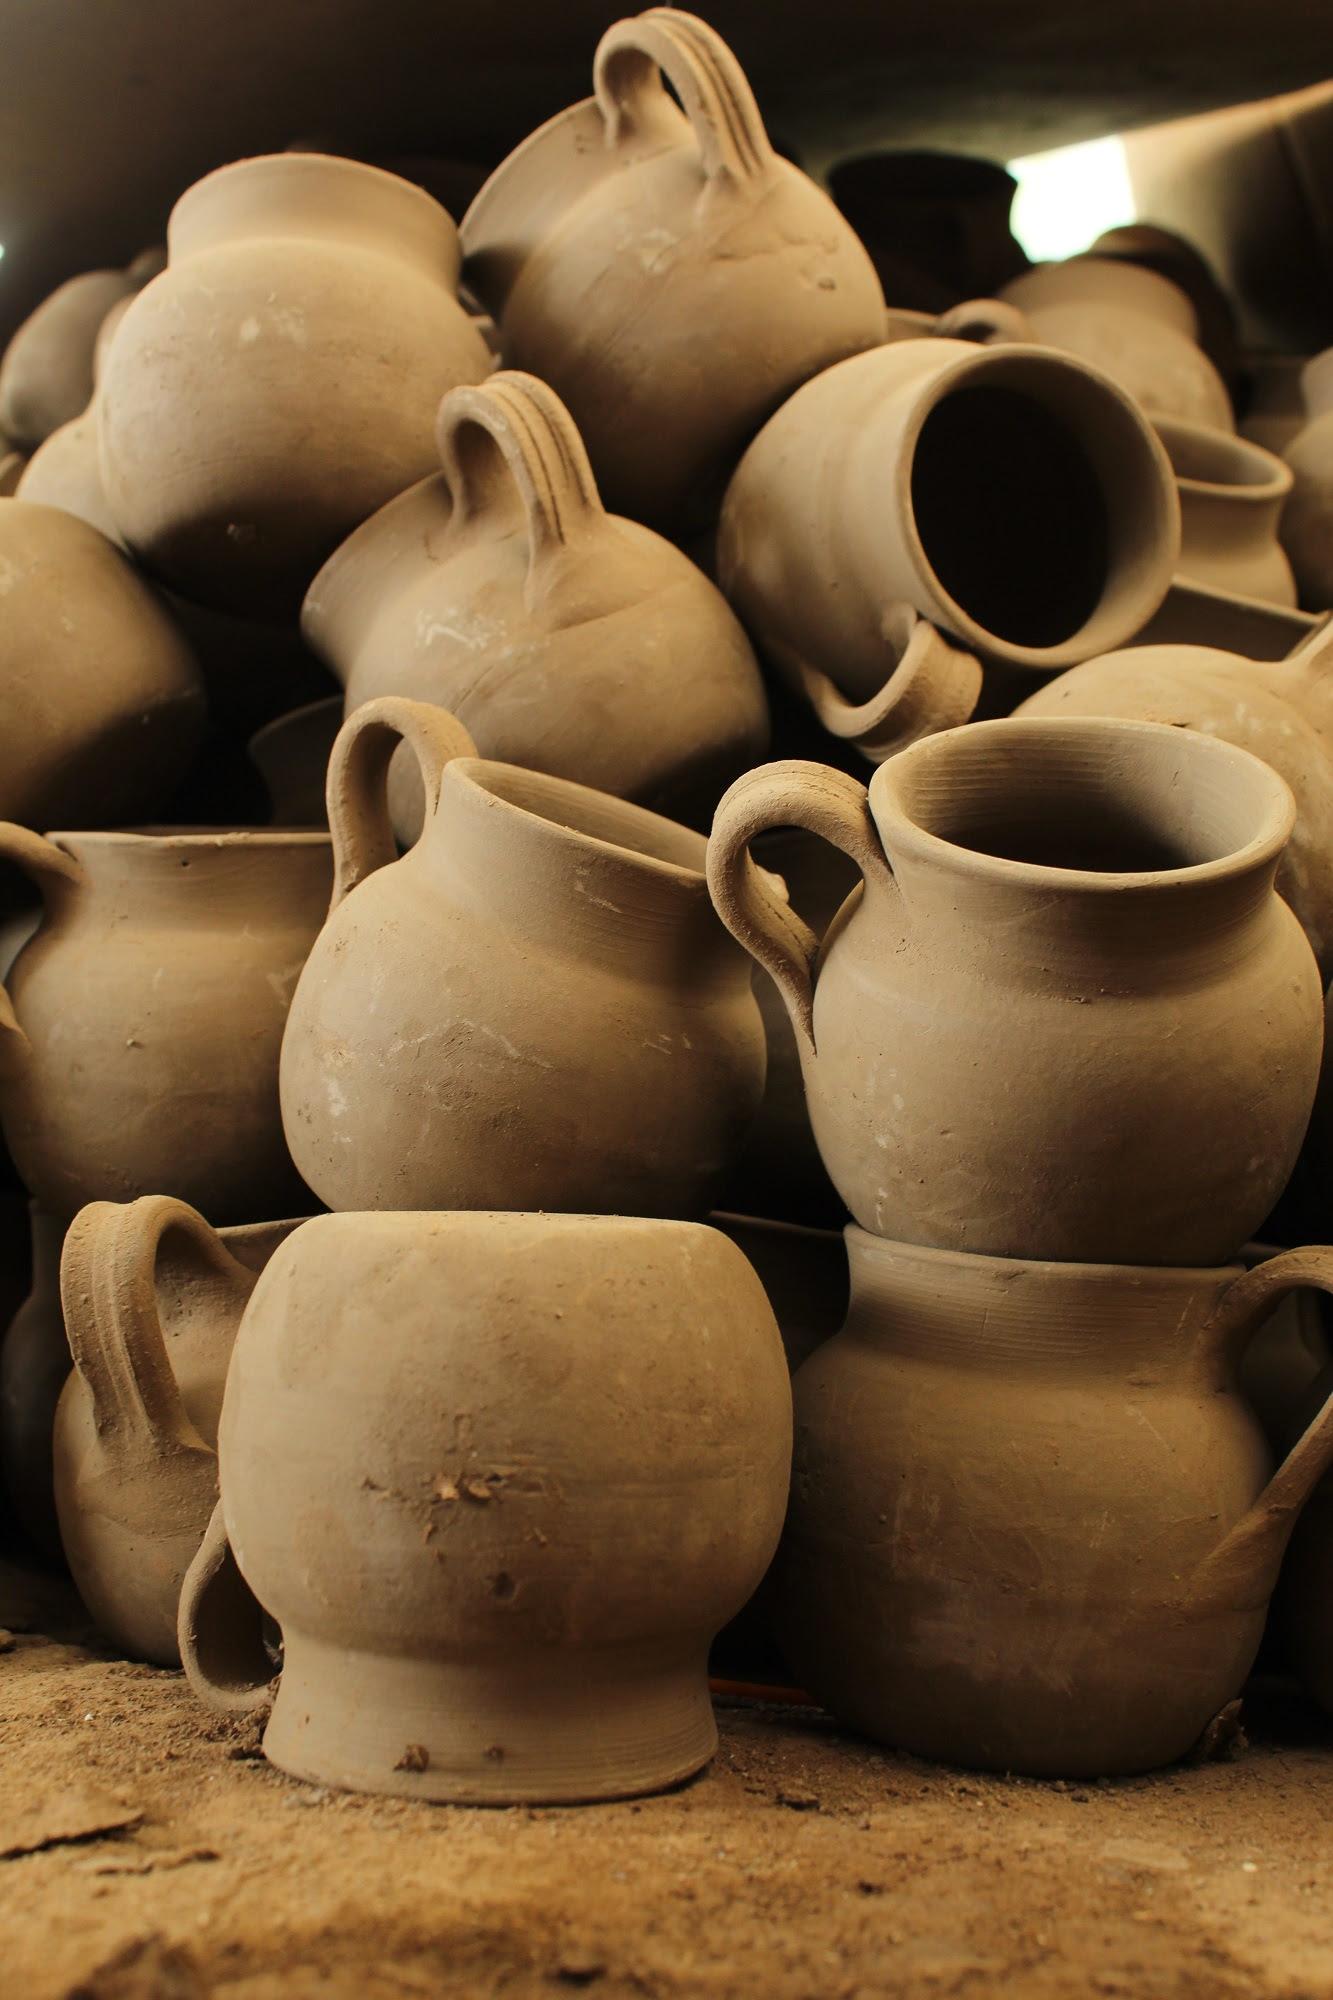 Artesanos dan vida al barro a través de la cerámica - May 3, 2021